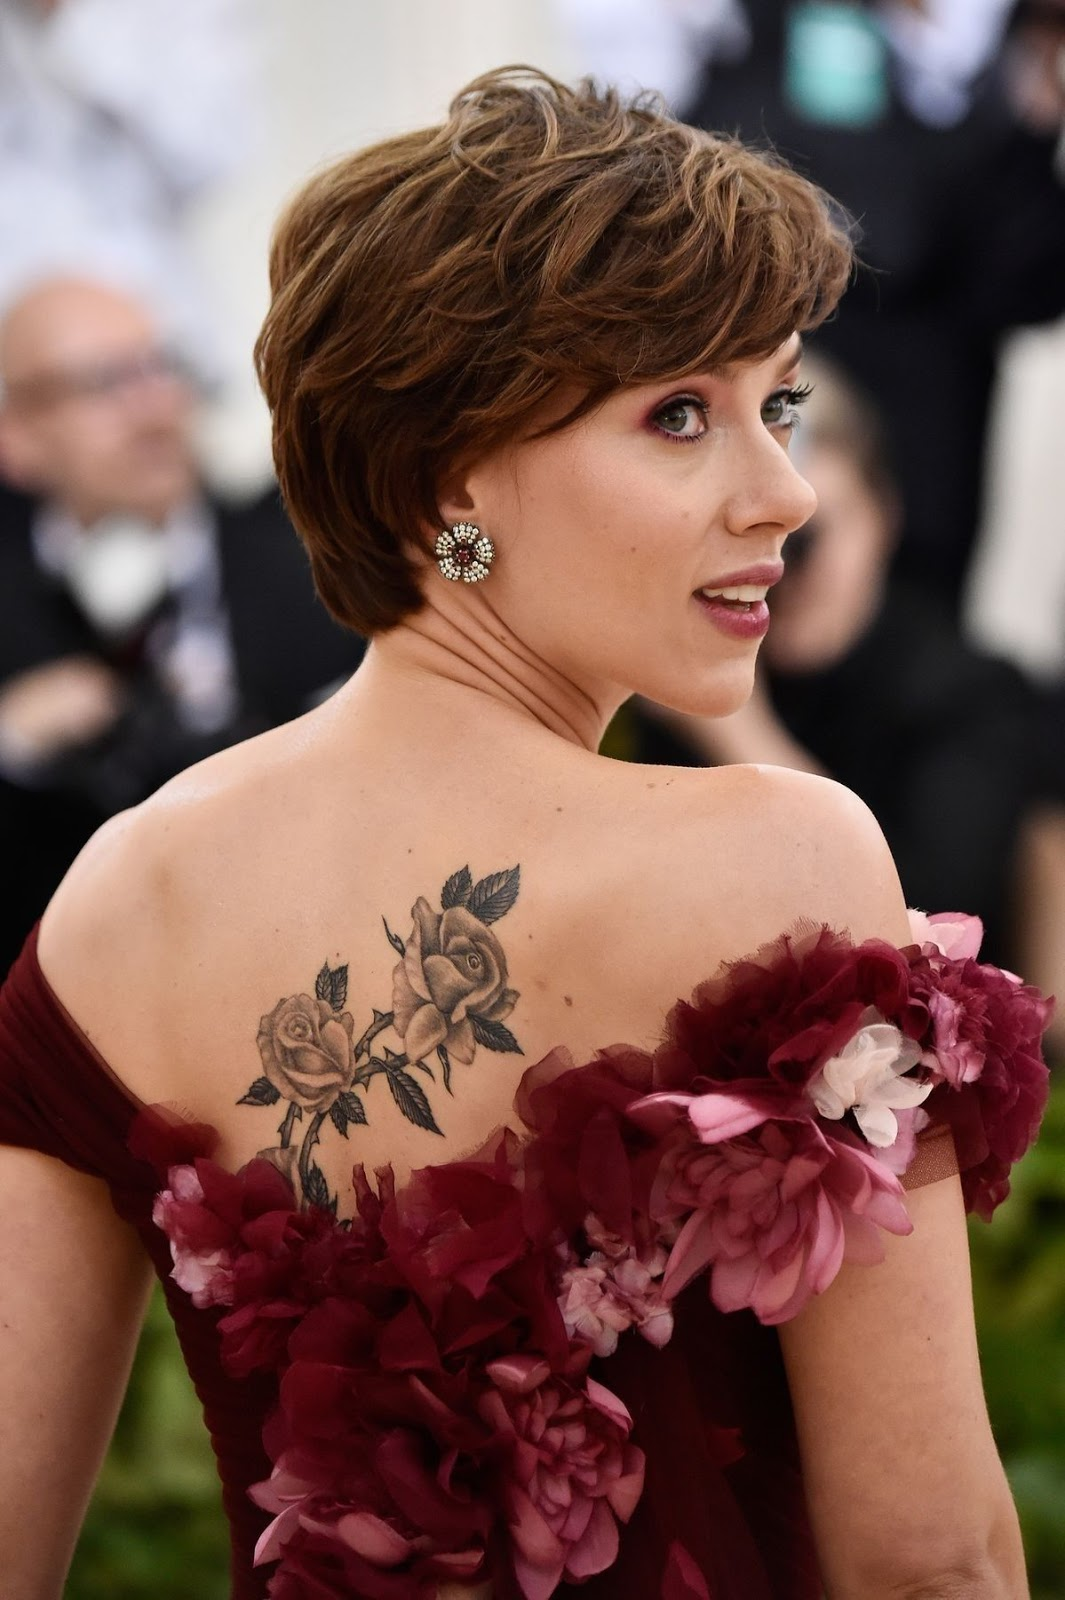 Scarlett Johansson-nude _Stunning-Wedding-Hairstyles-For-Long-Hair-Trending-Dirt- Get Skin Care Tips ,Hair Care Tips ,Hairstyling Tips ,Makeup Tips ,Fashion Tips ,Personal Grooming.K jpg